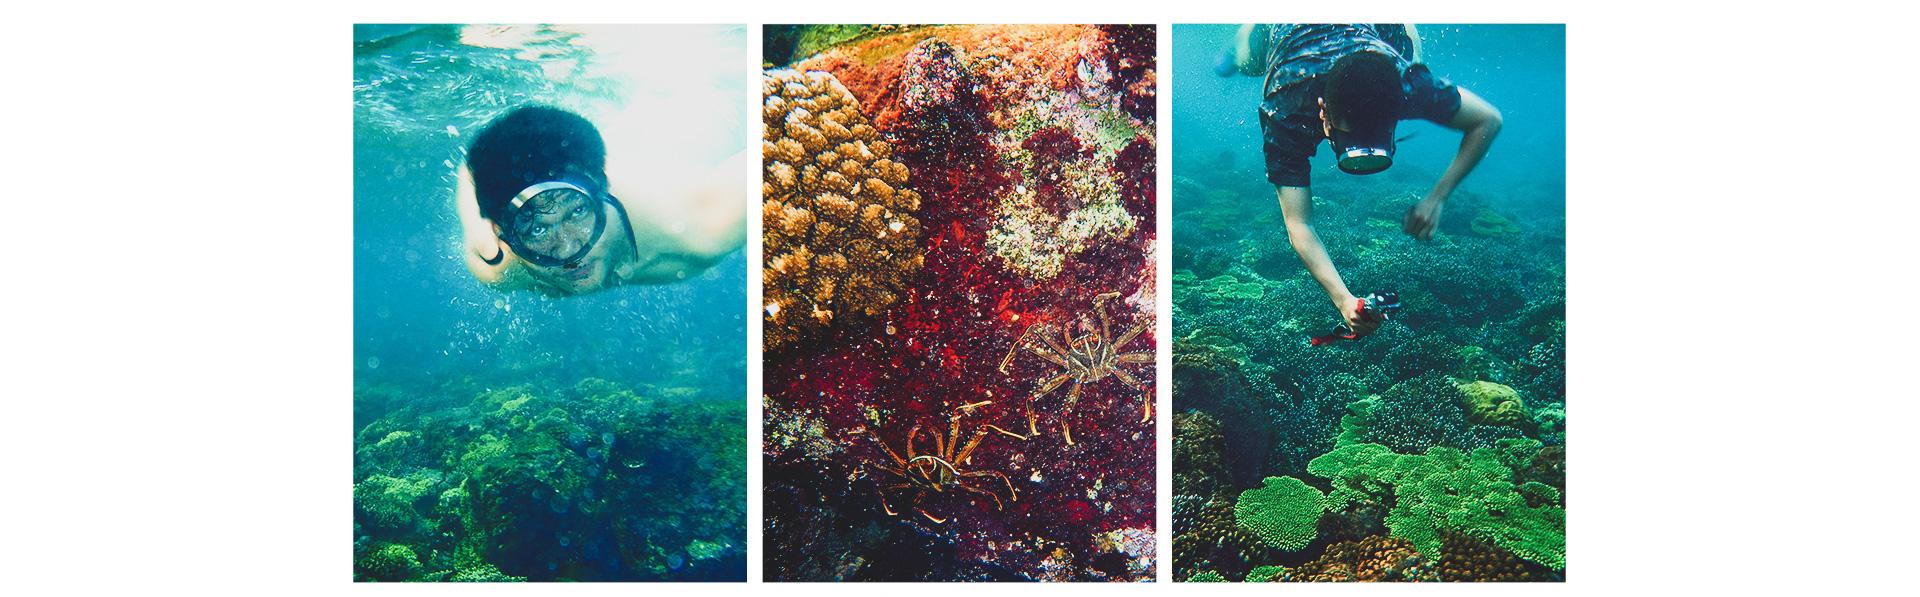 Tourists dive and view coral ranges in Con Co Island. Photo: The Kiet / Tuoi Tre